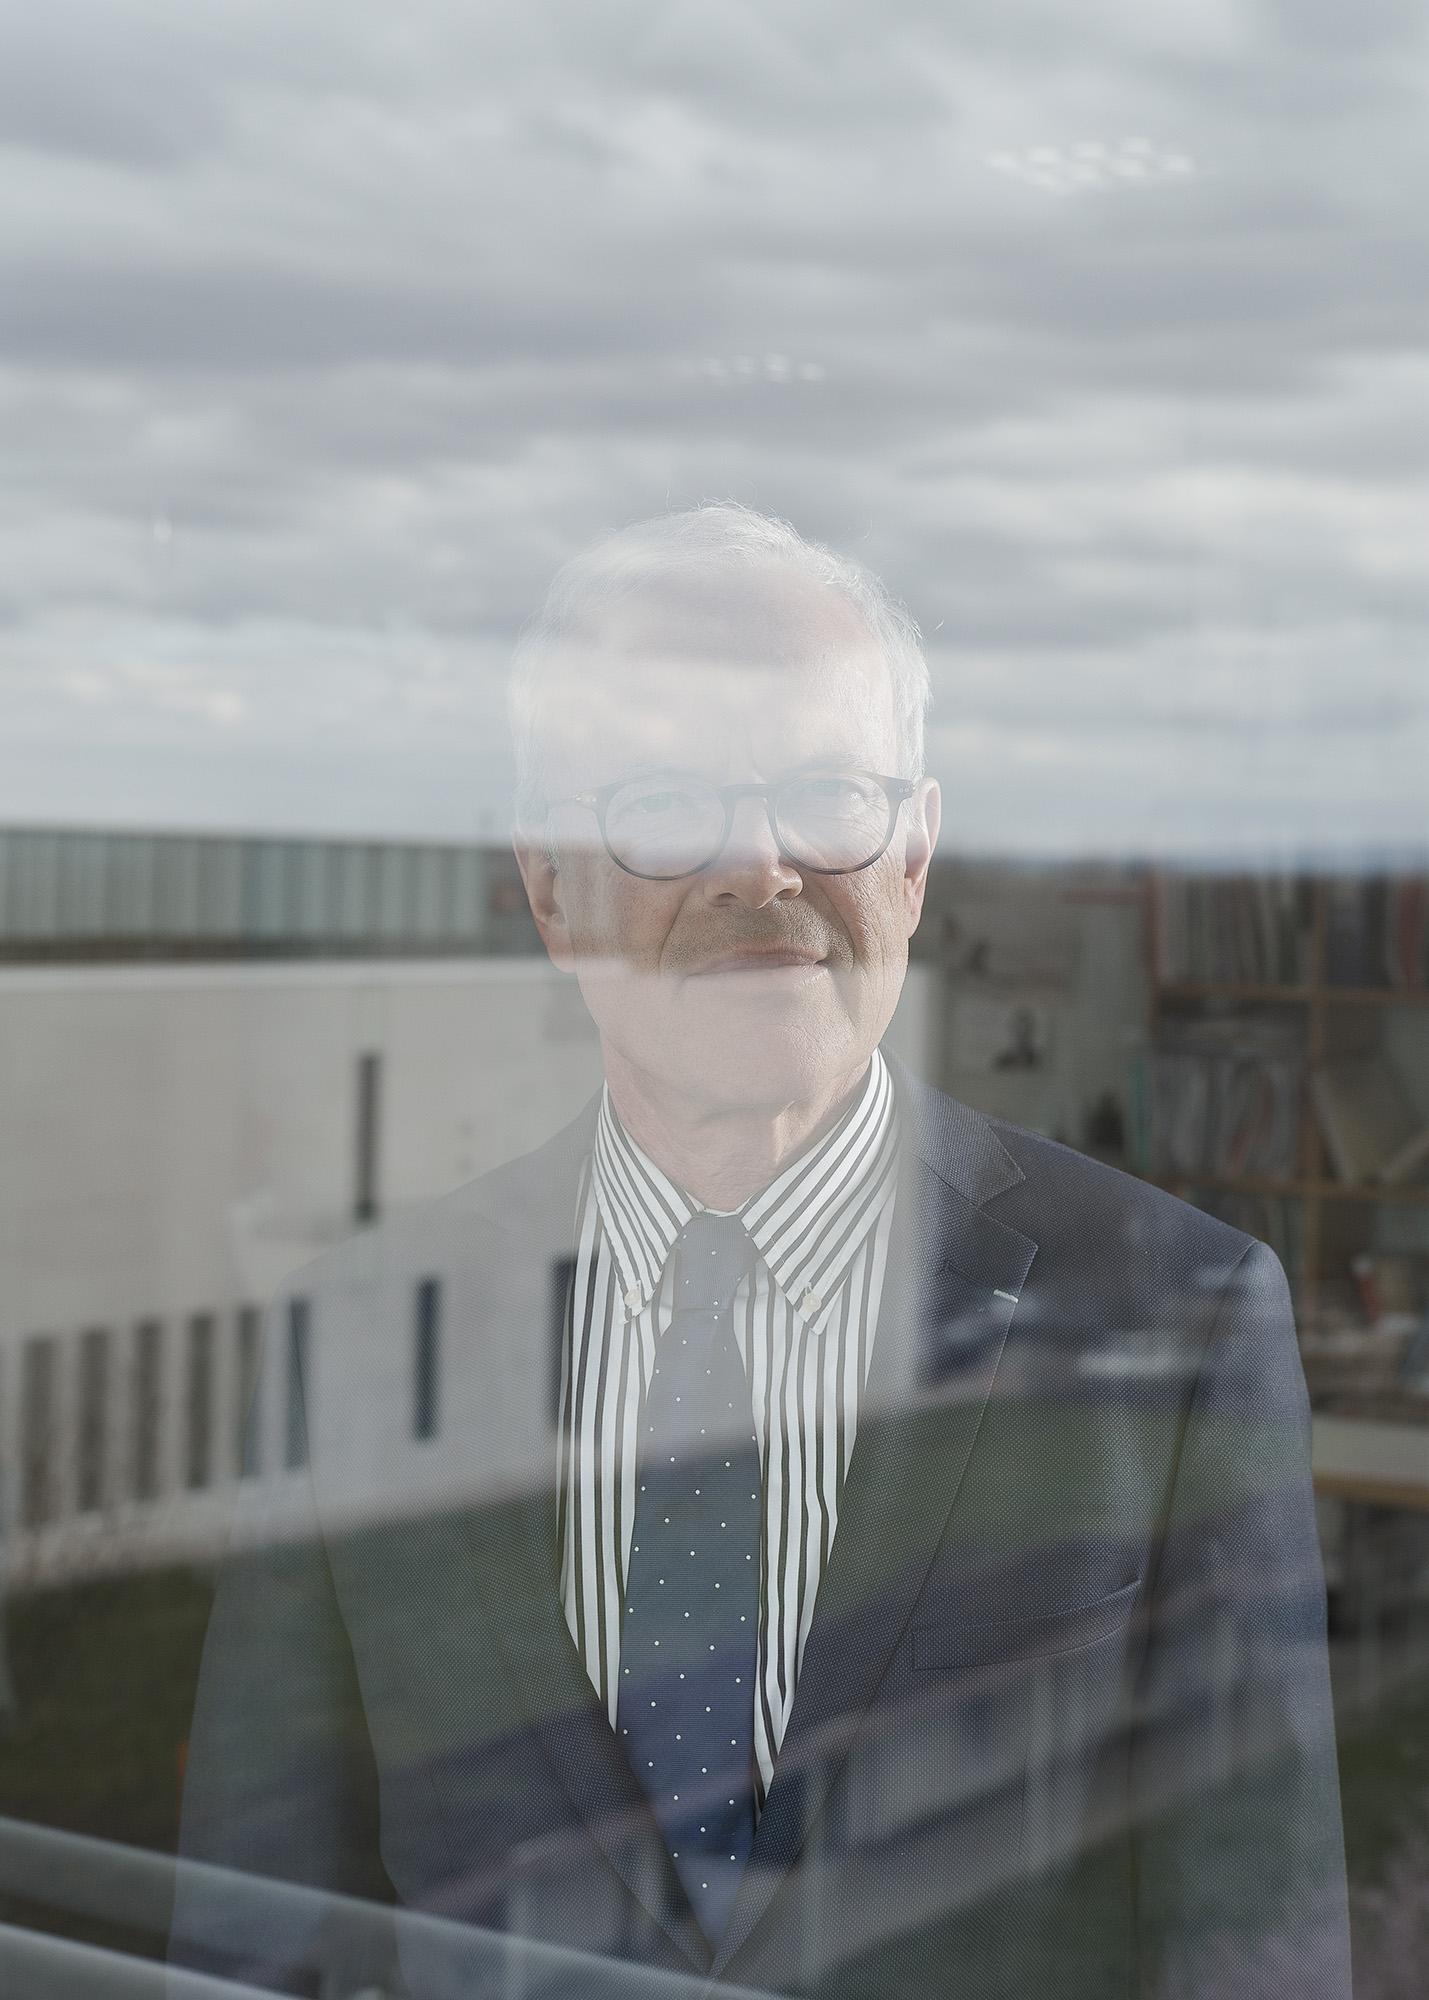 Pierre Hugel